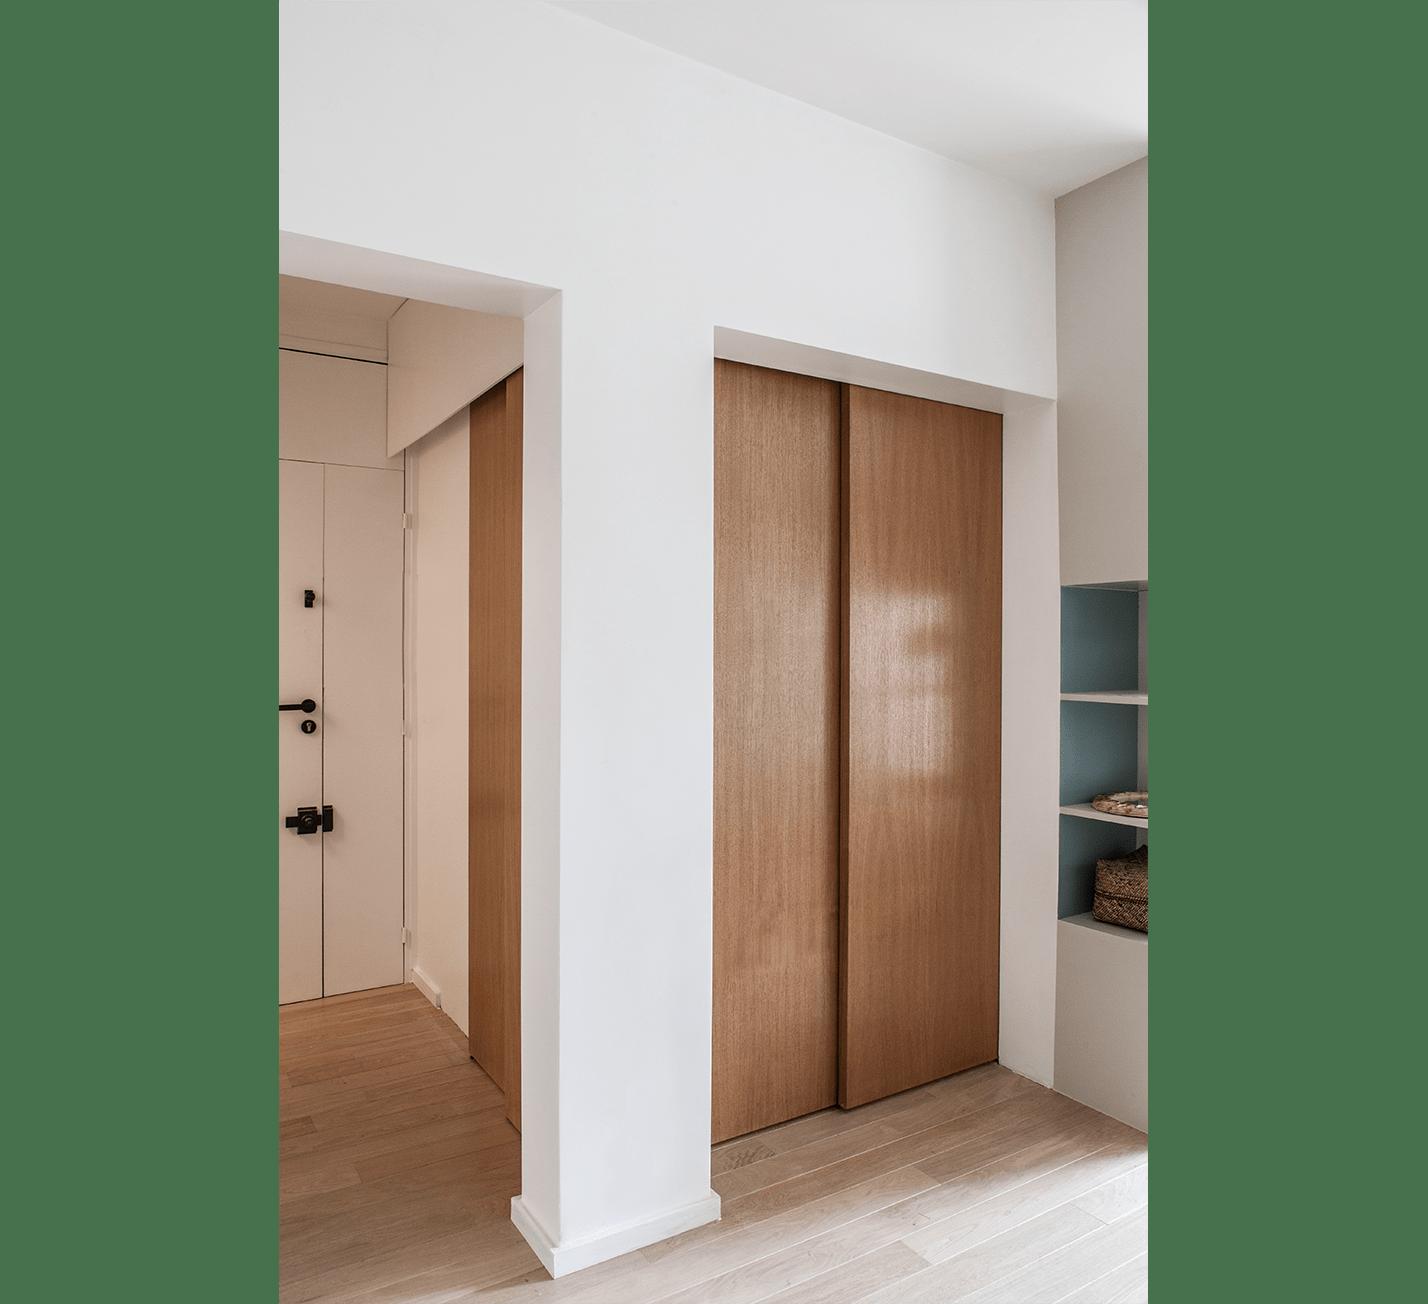 Projet-Albert-Atelier-Steve-Pauline-Borgia-Architecte-interieur-11-min-1